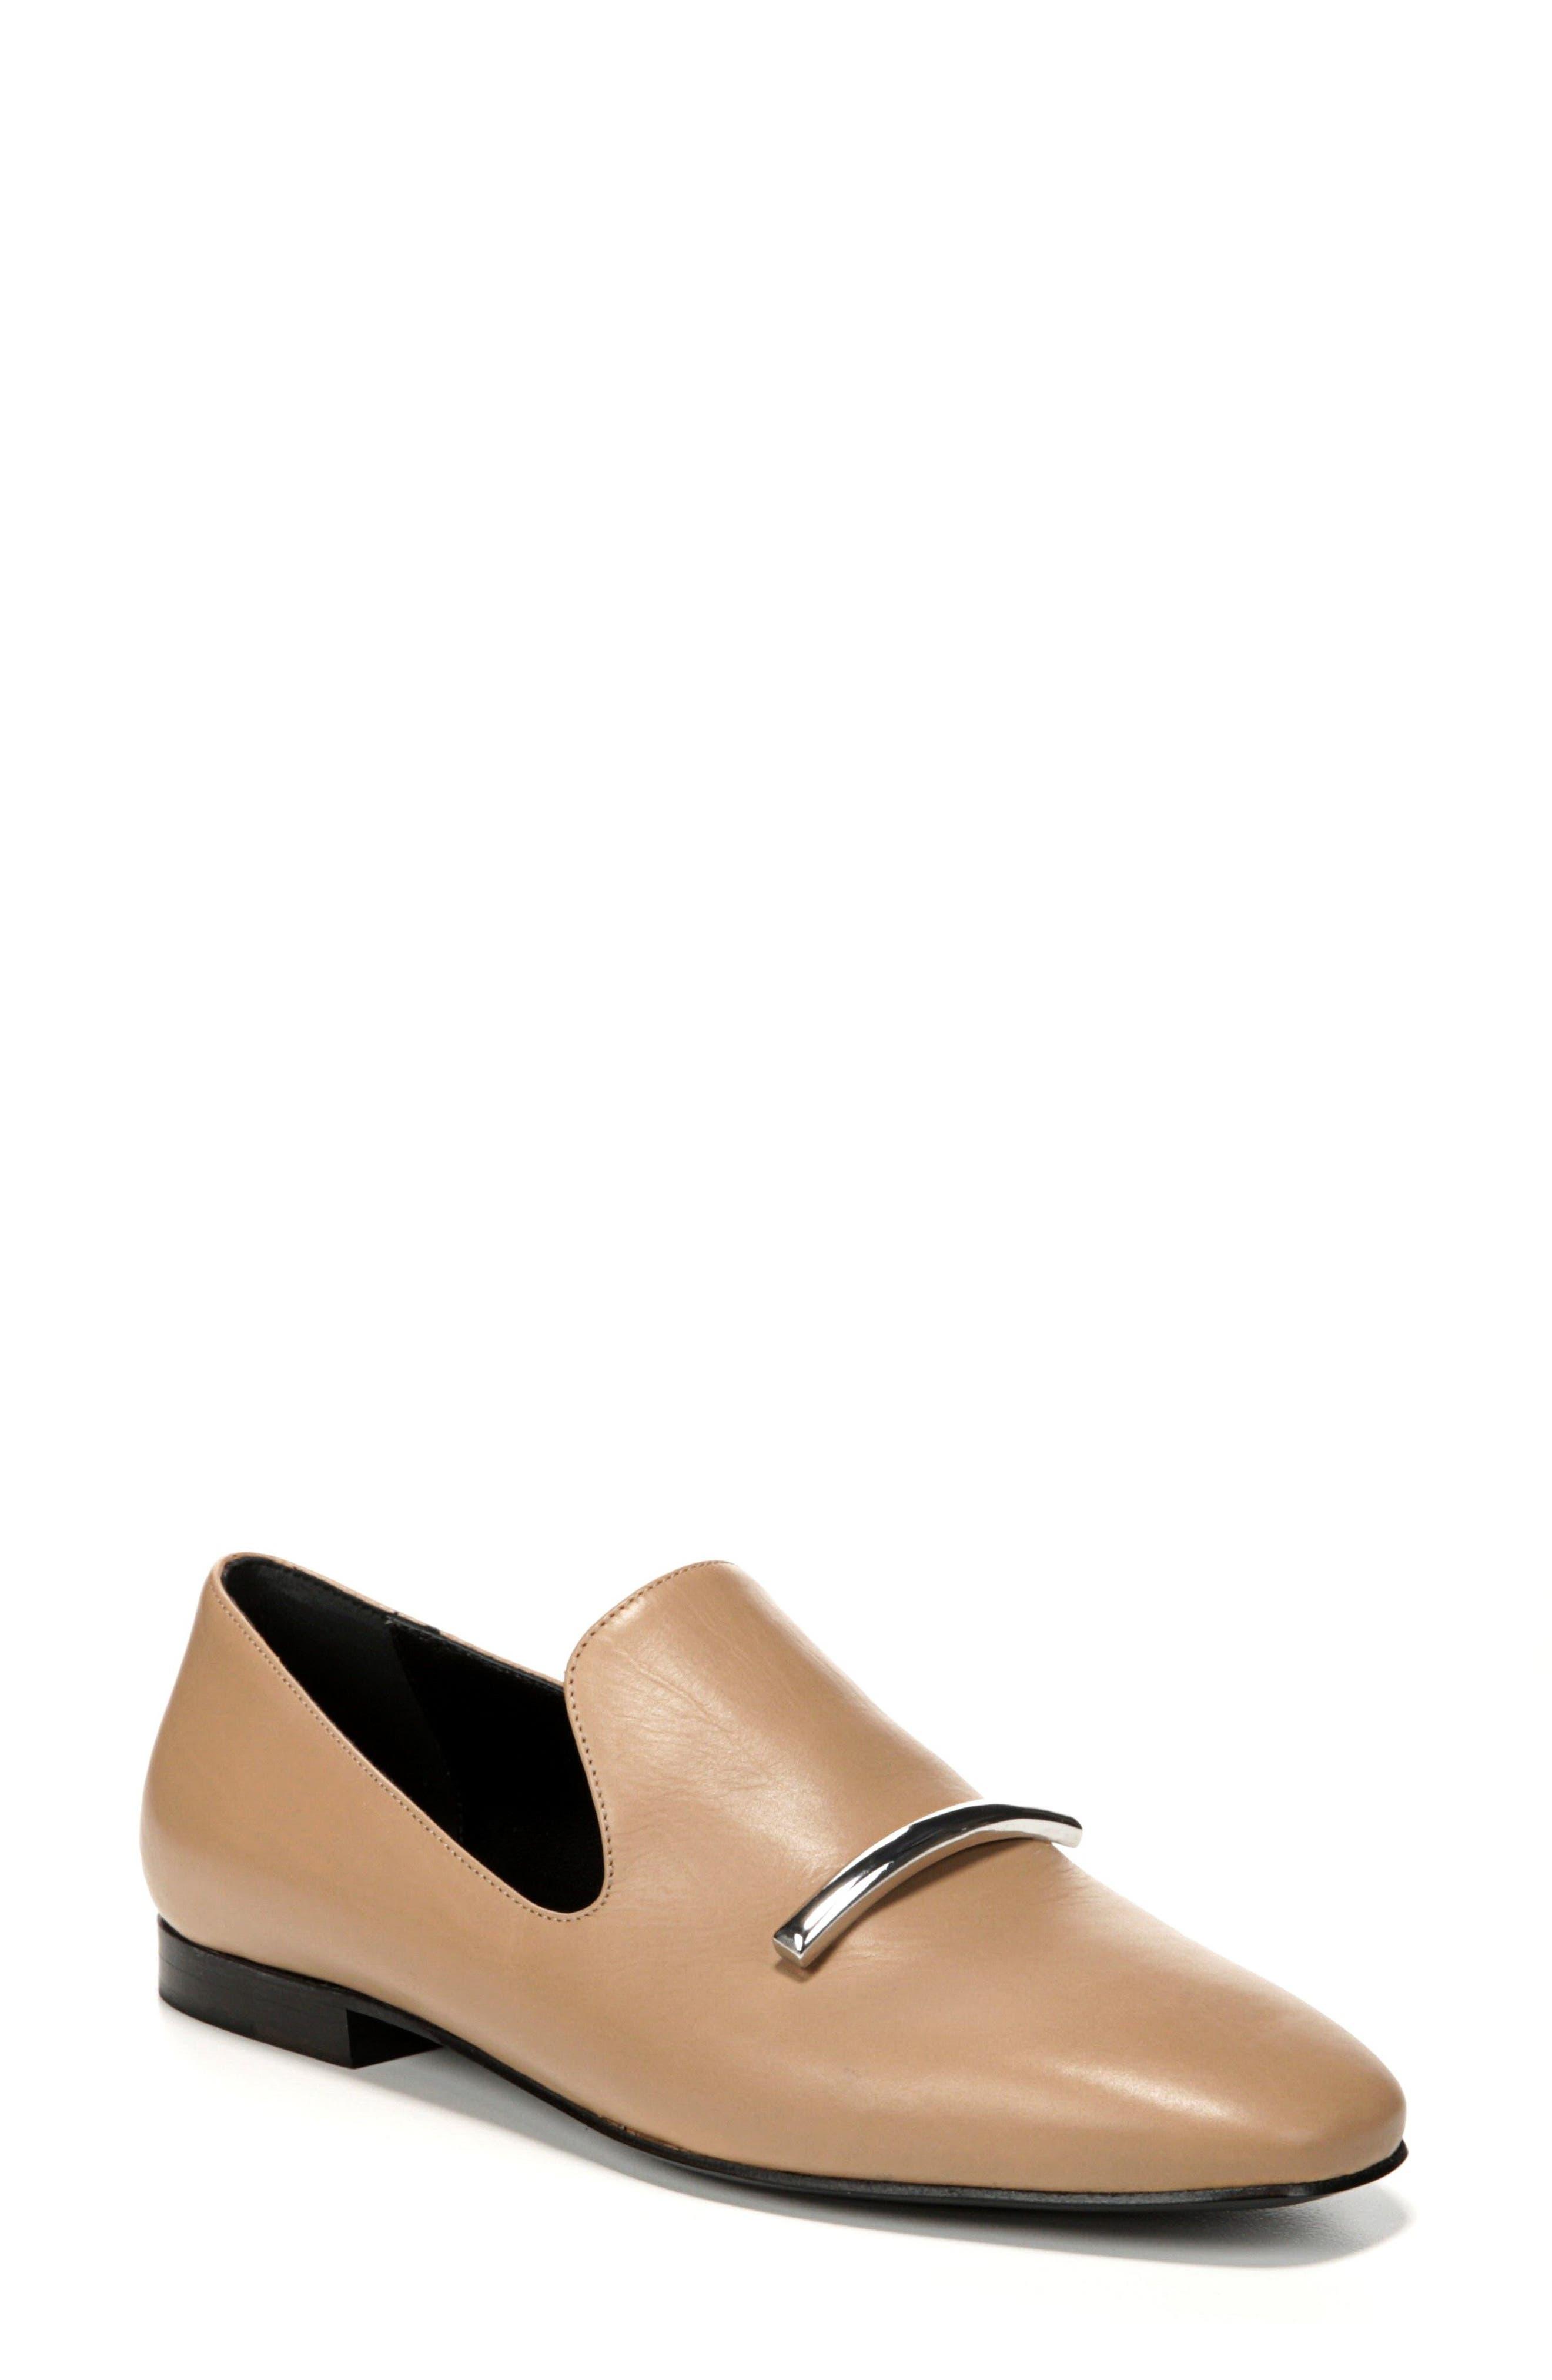 VIA SPIGA, Tallis Flat Loafer, Main thumbnail 1, color, 250